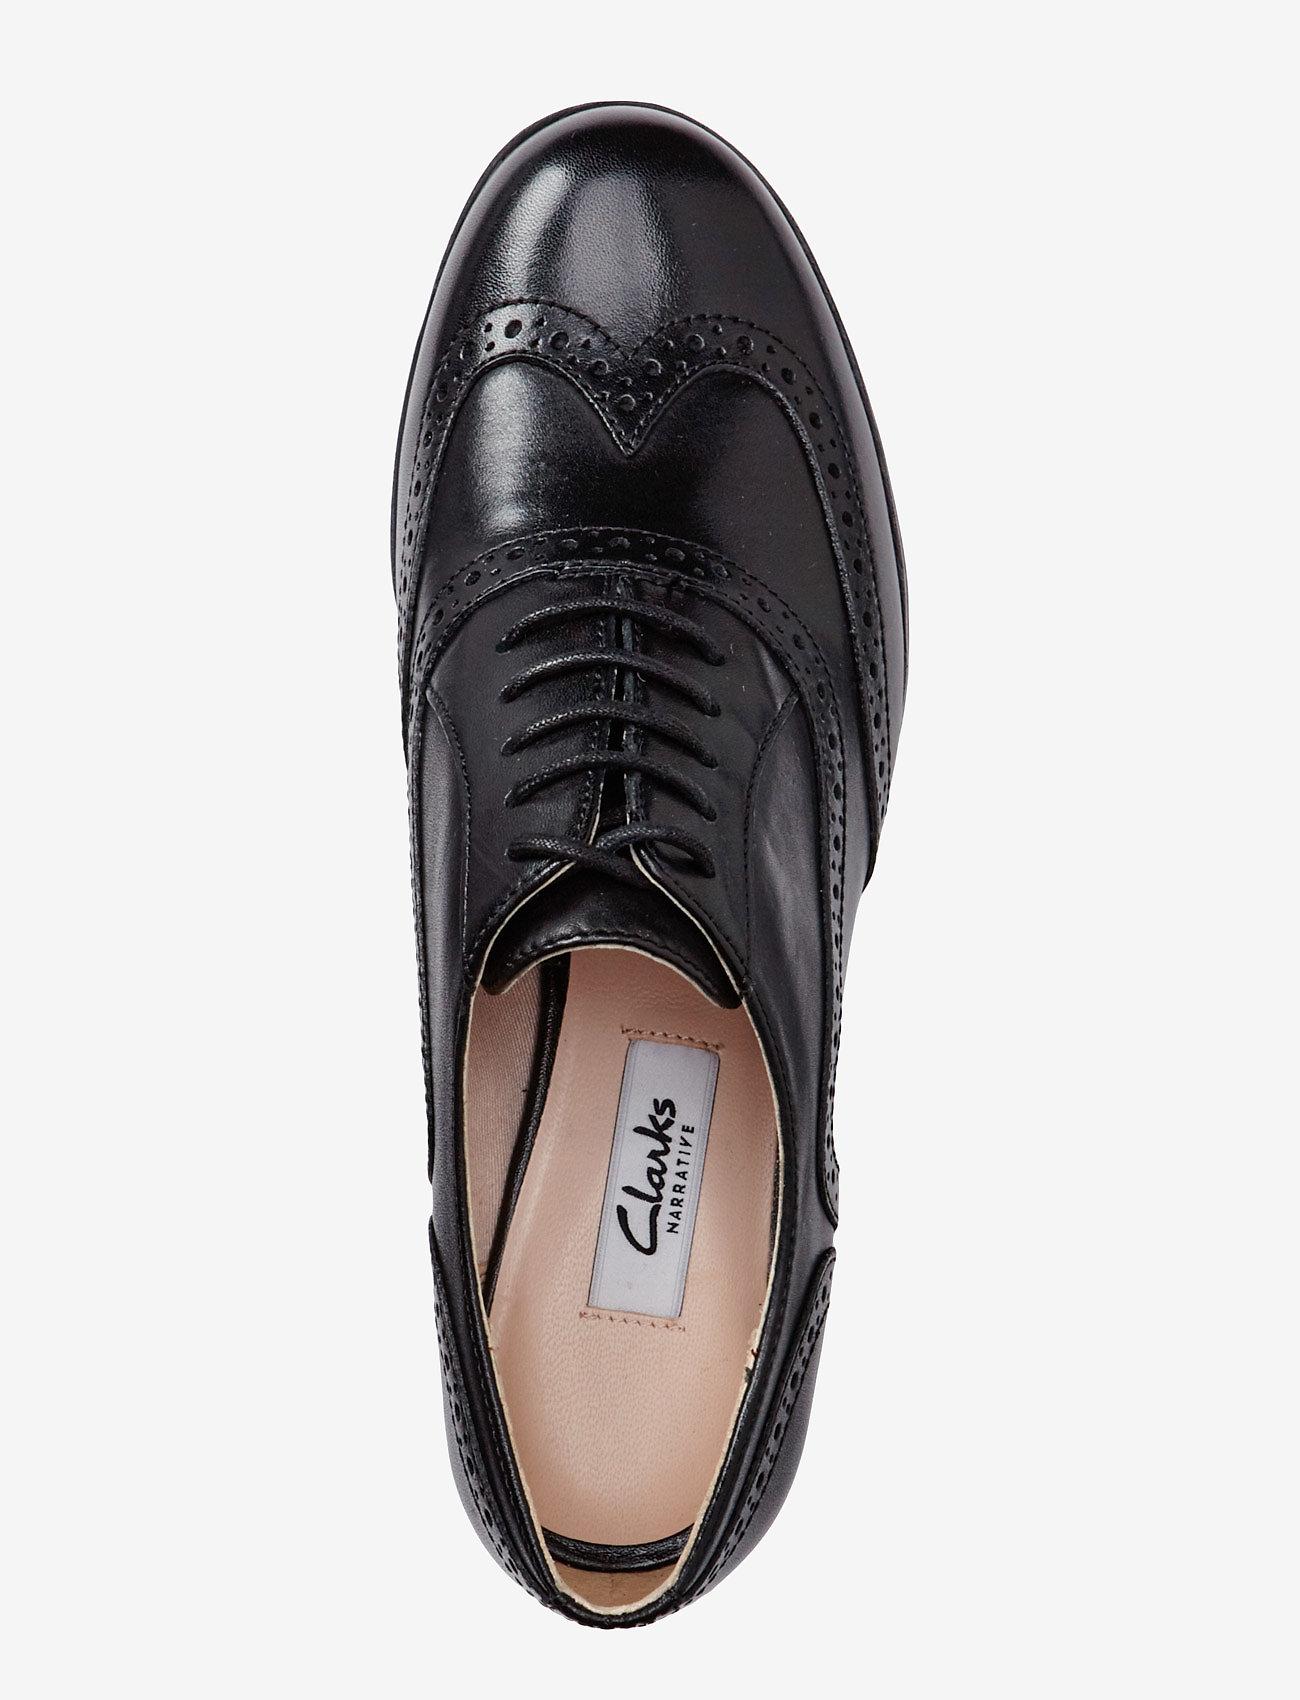 Hamble Oak (Black Leather) - Clarks gfvRED